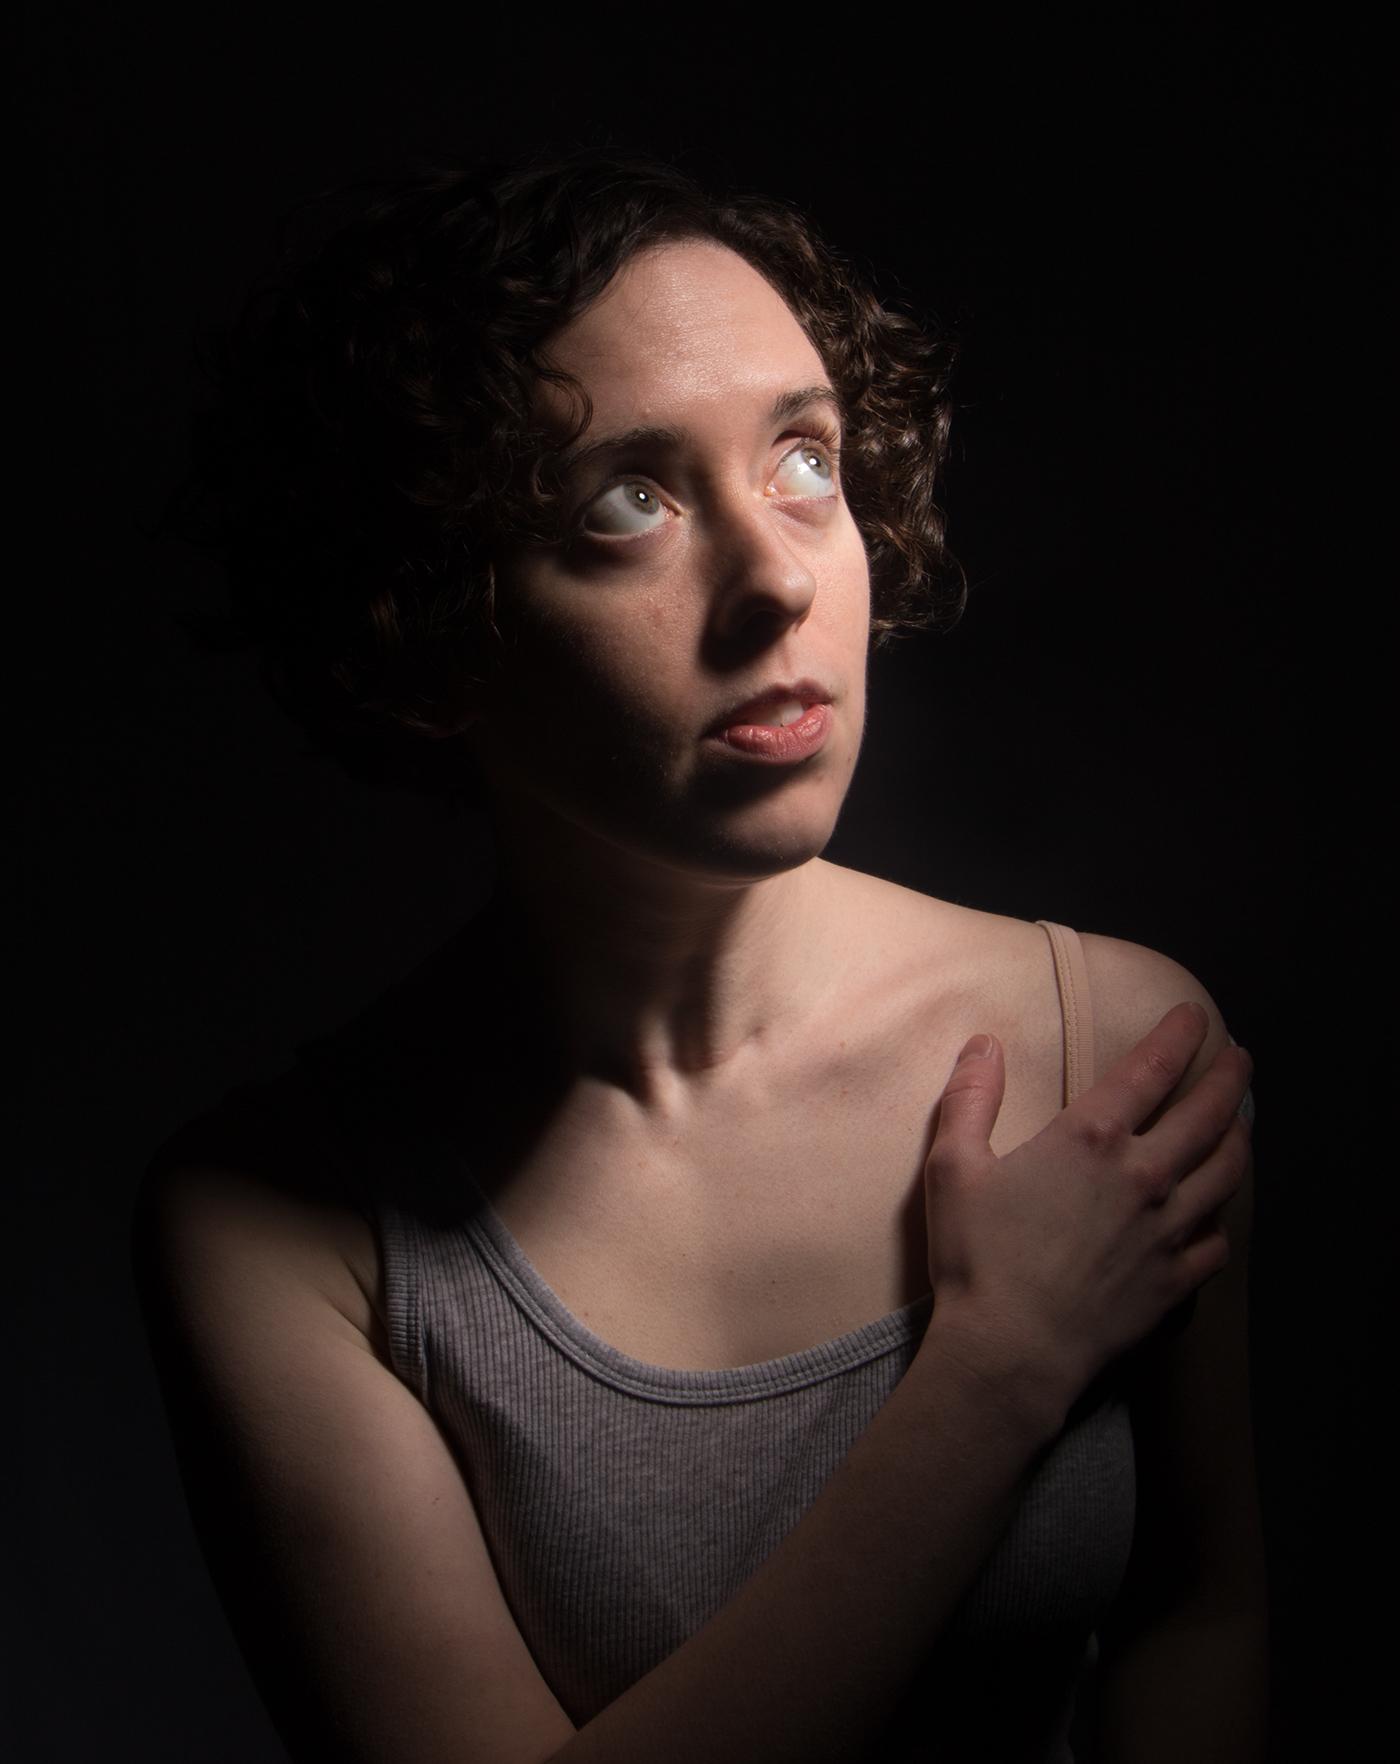 portraits lighting Photography  dramatic